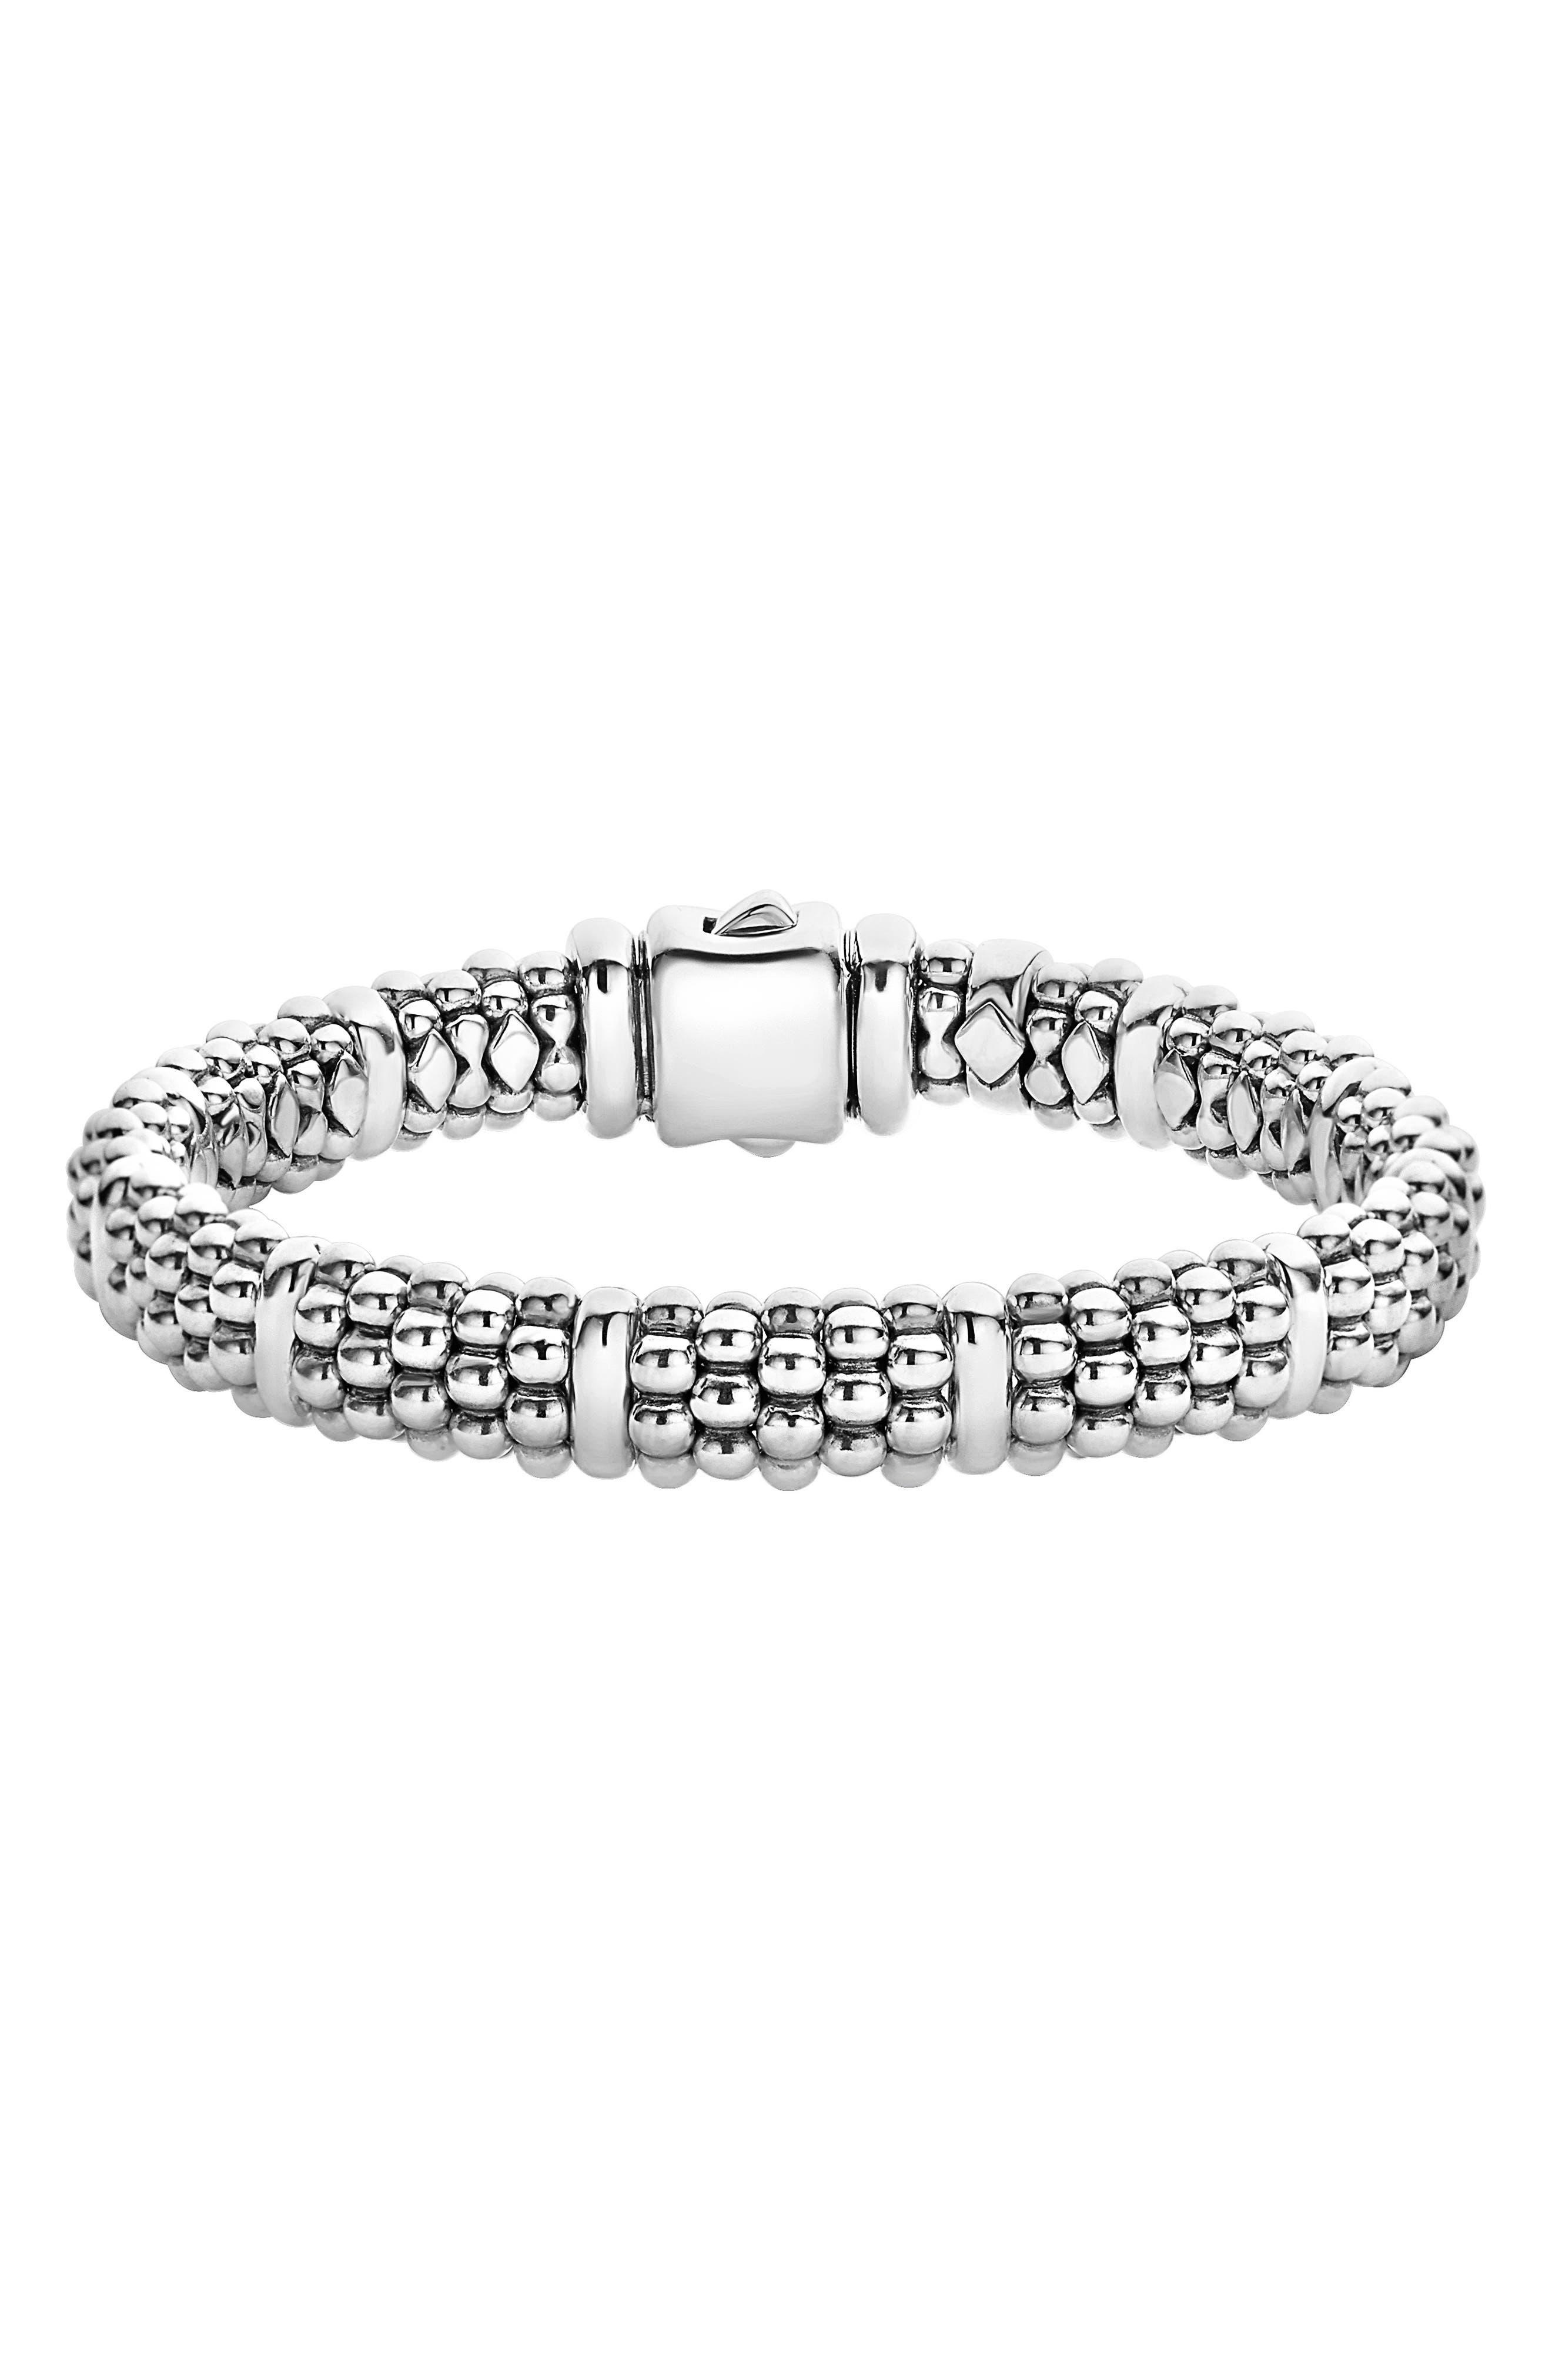 LAGOS, Oval Rope Caviar Bracelet, Main thumbnail 1, color, SILVER